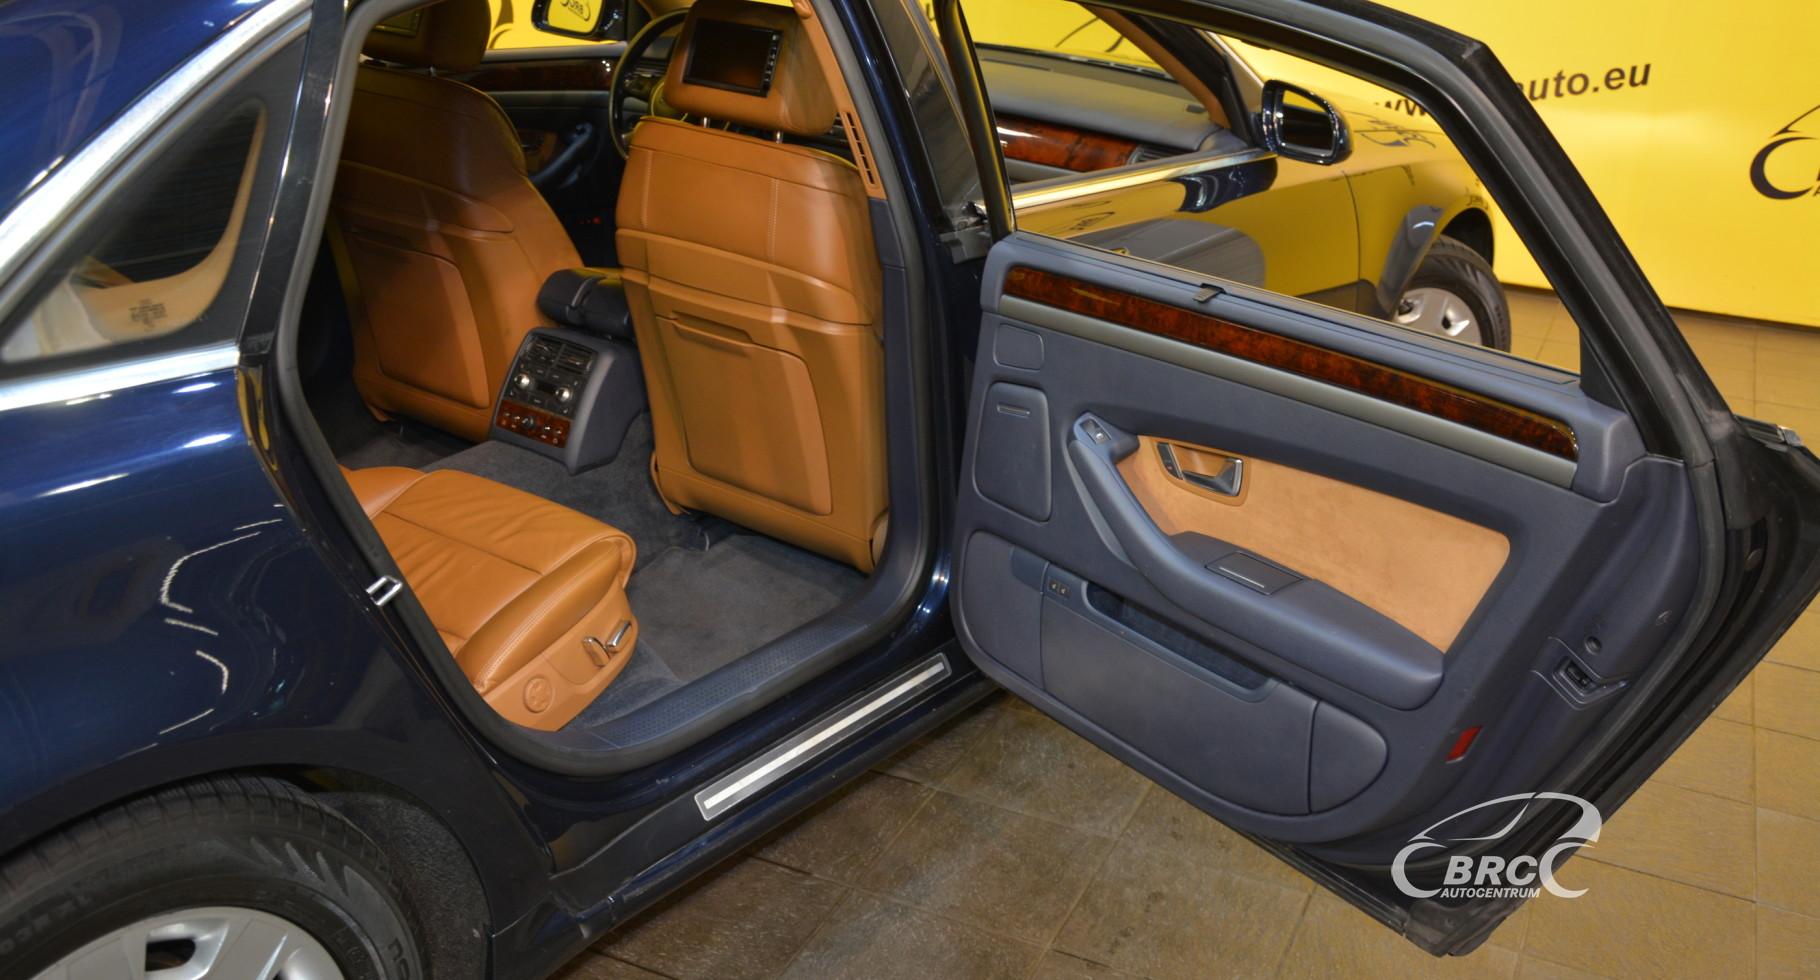 Audi A8 L 4.0 TDI Quattro Automatas